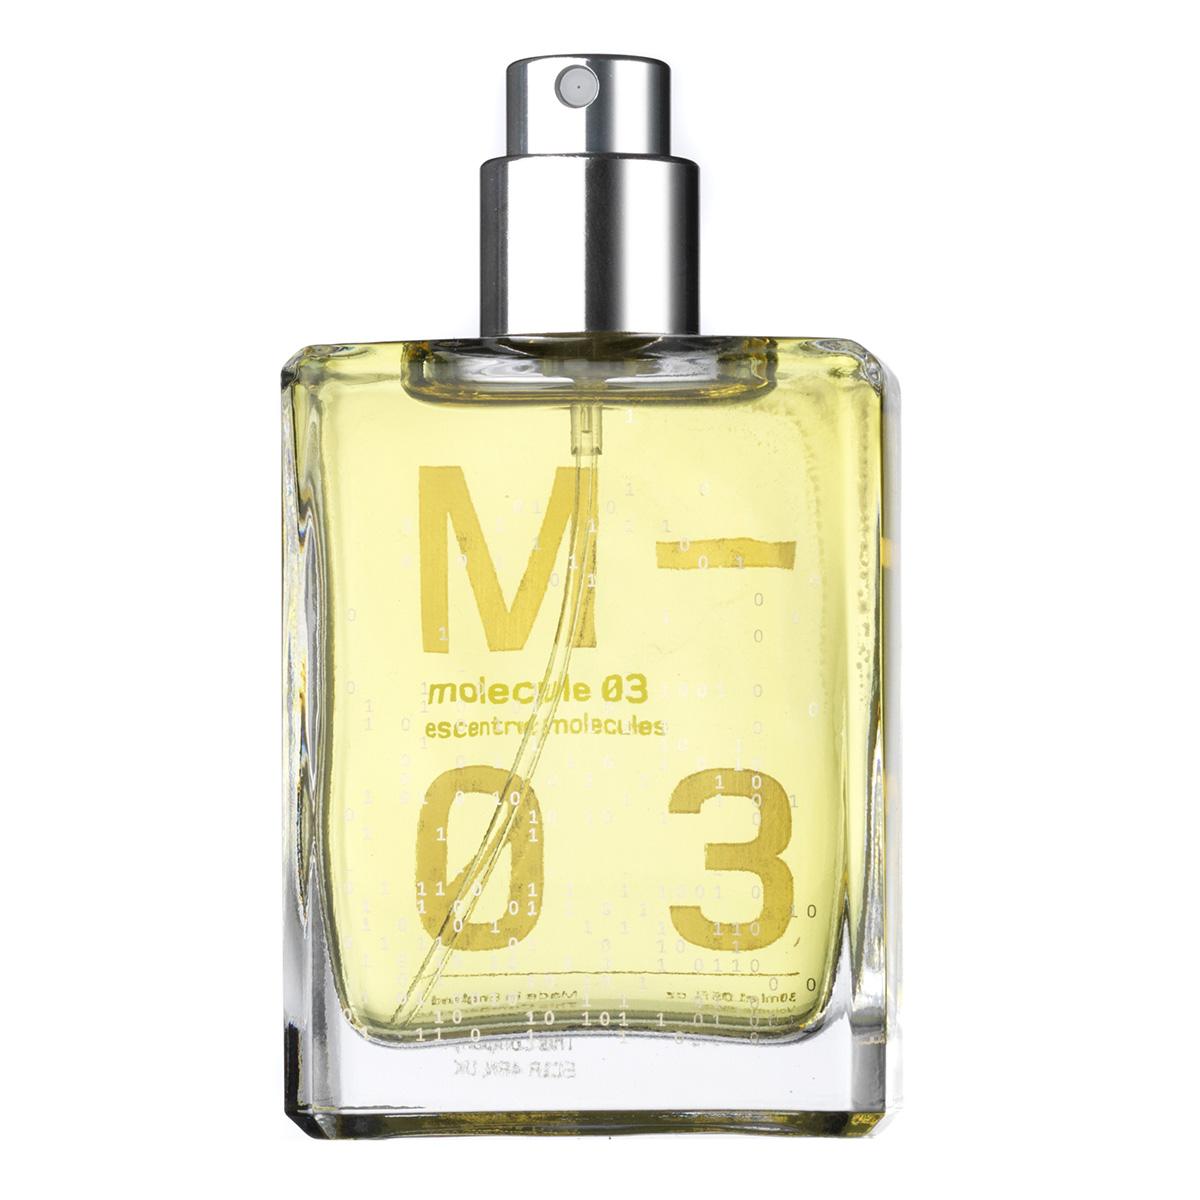 Escentric Molecules Molecule 03 EdT - 30 ml refill